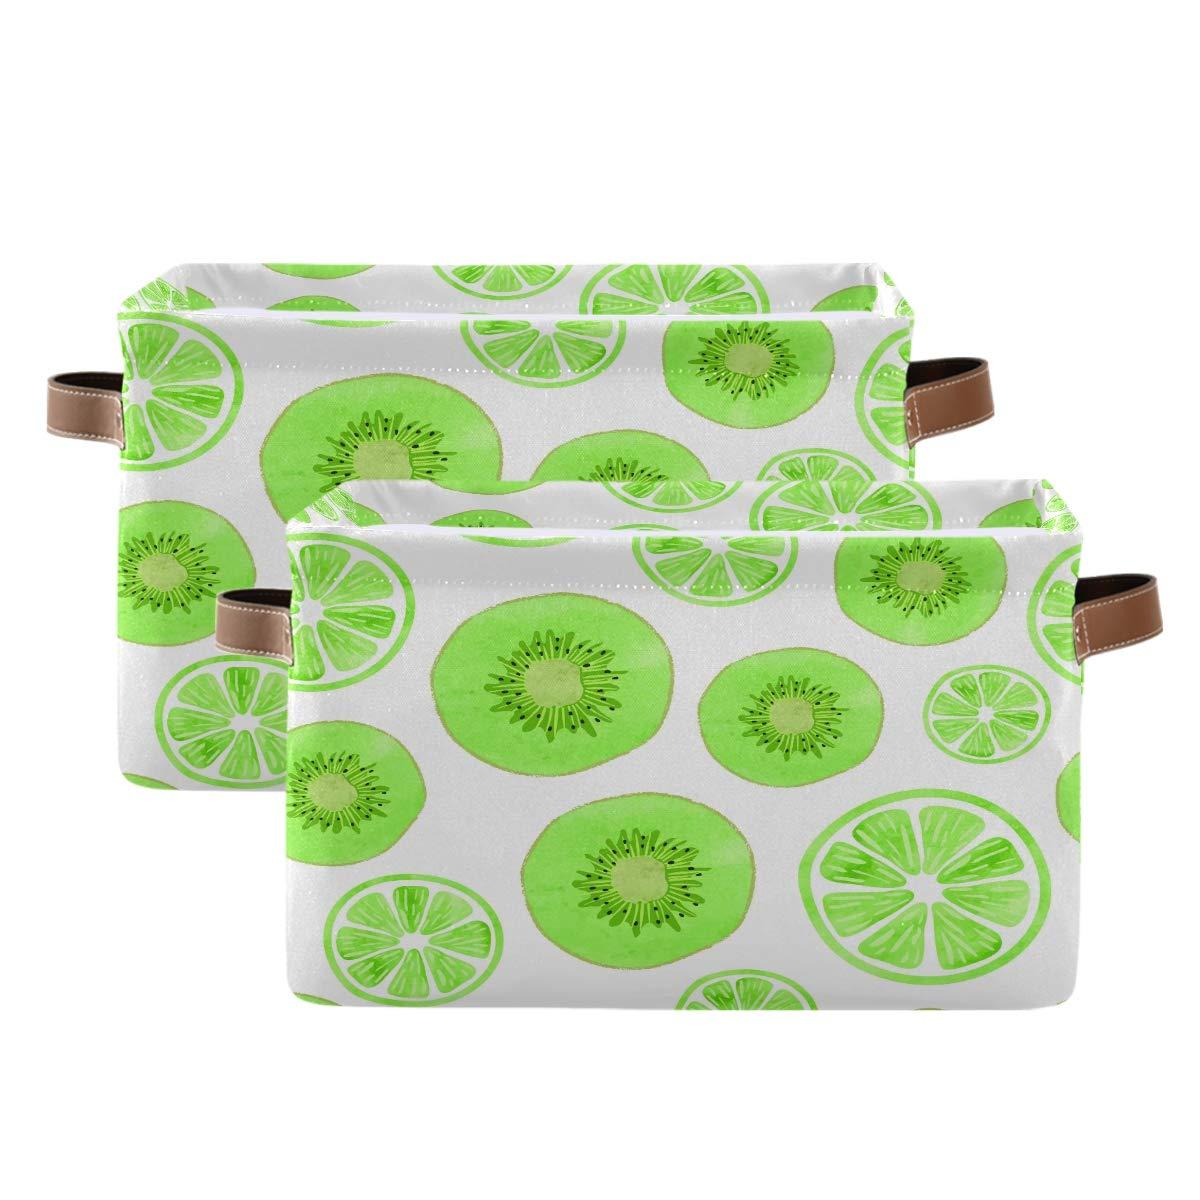 Nashville-Davidson Mall WXLIFE Storage Basket Bins Kiwi Storag Online limited product Lemon Fruit Pattern Large